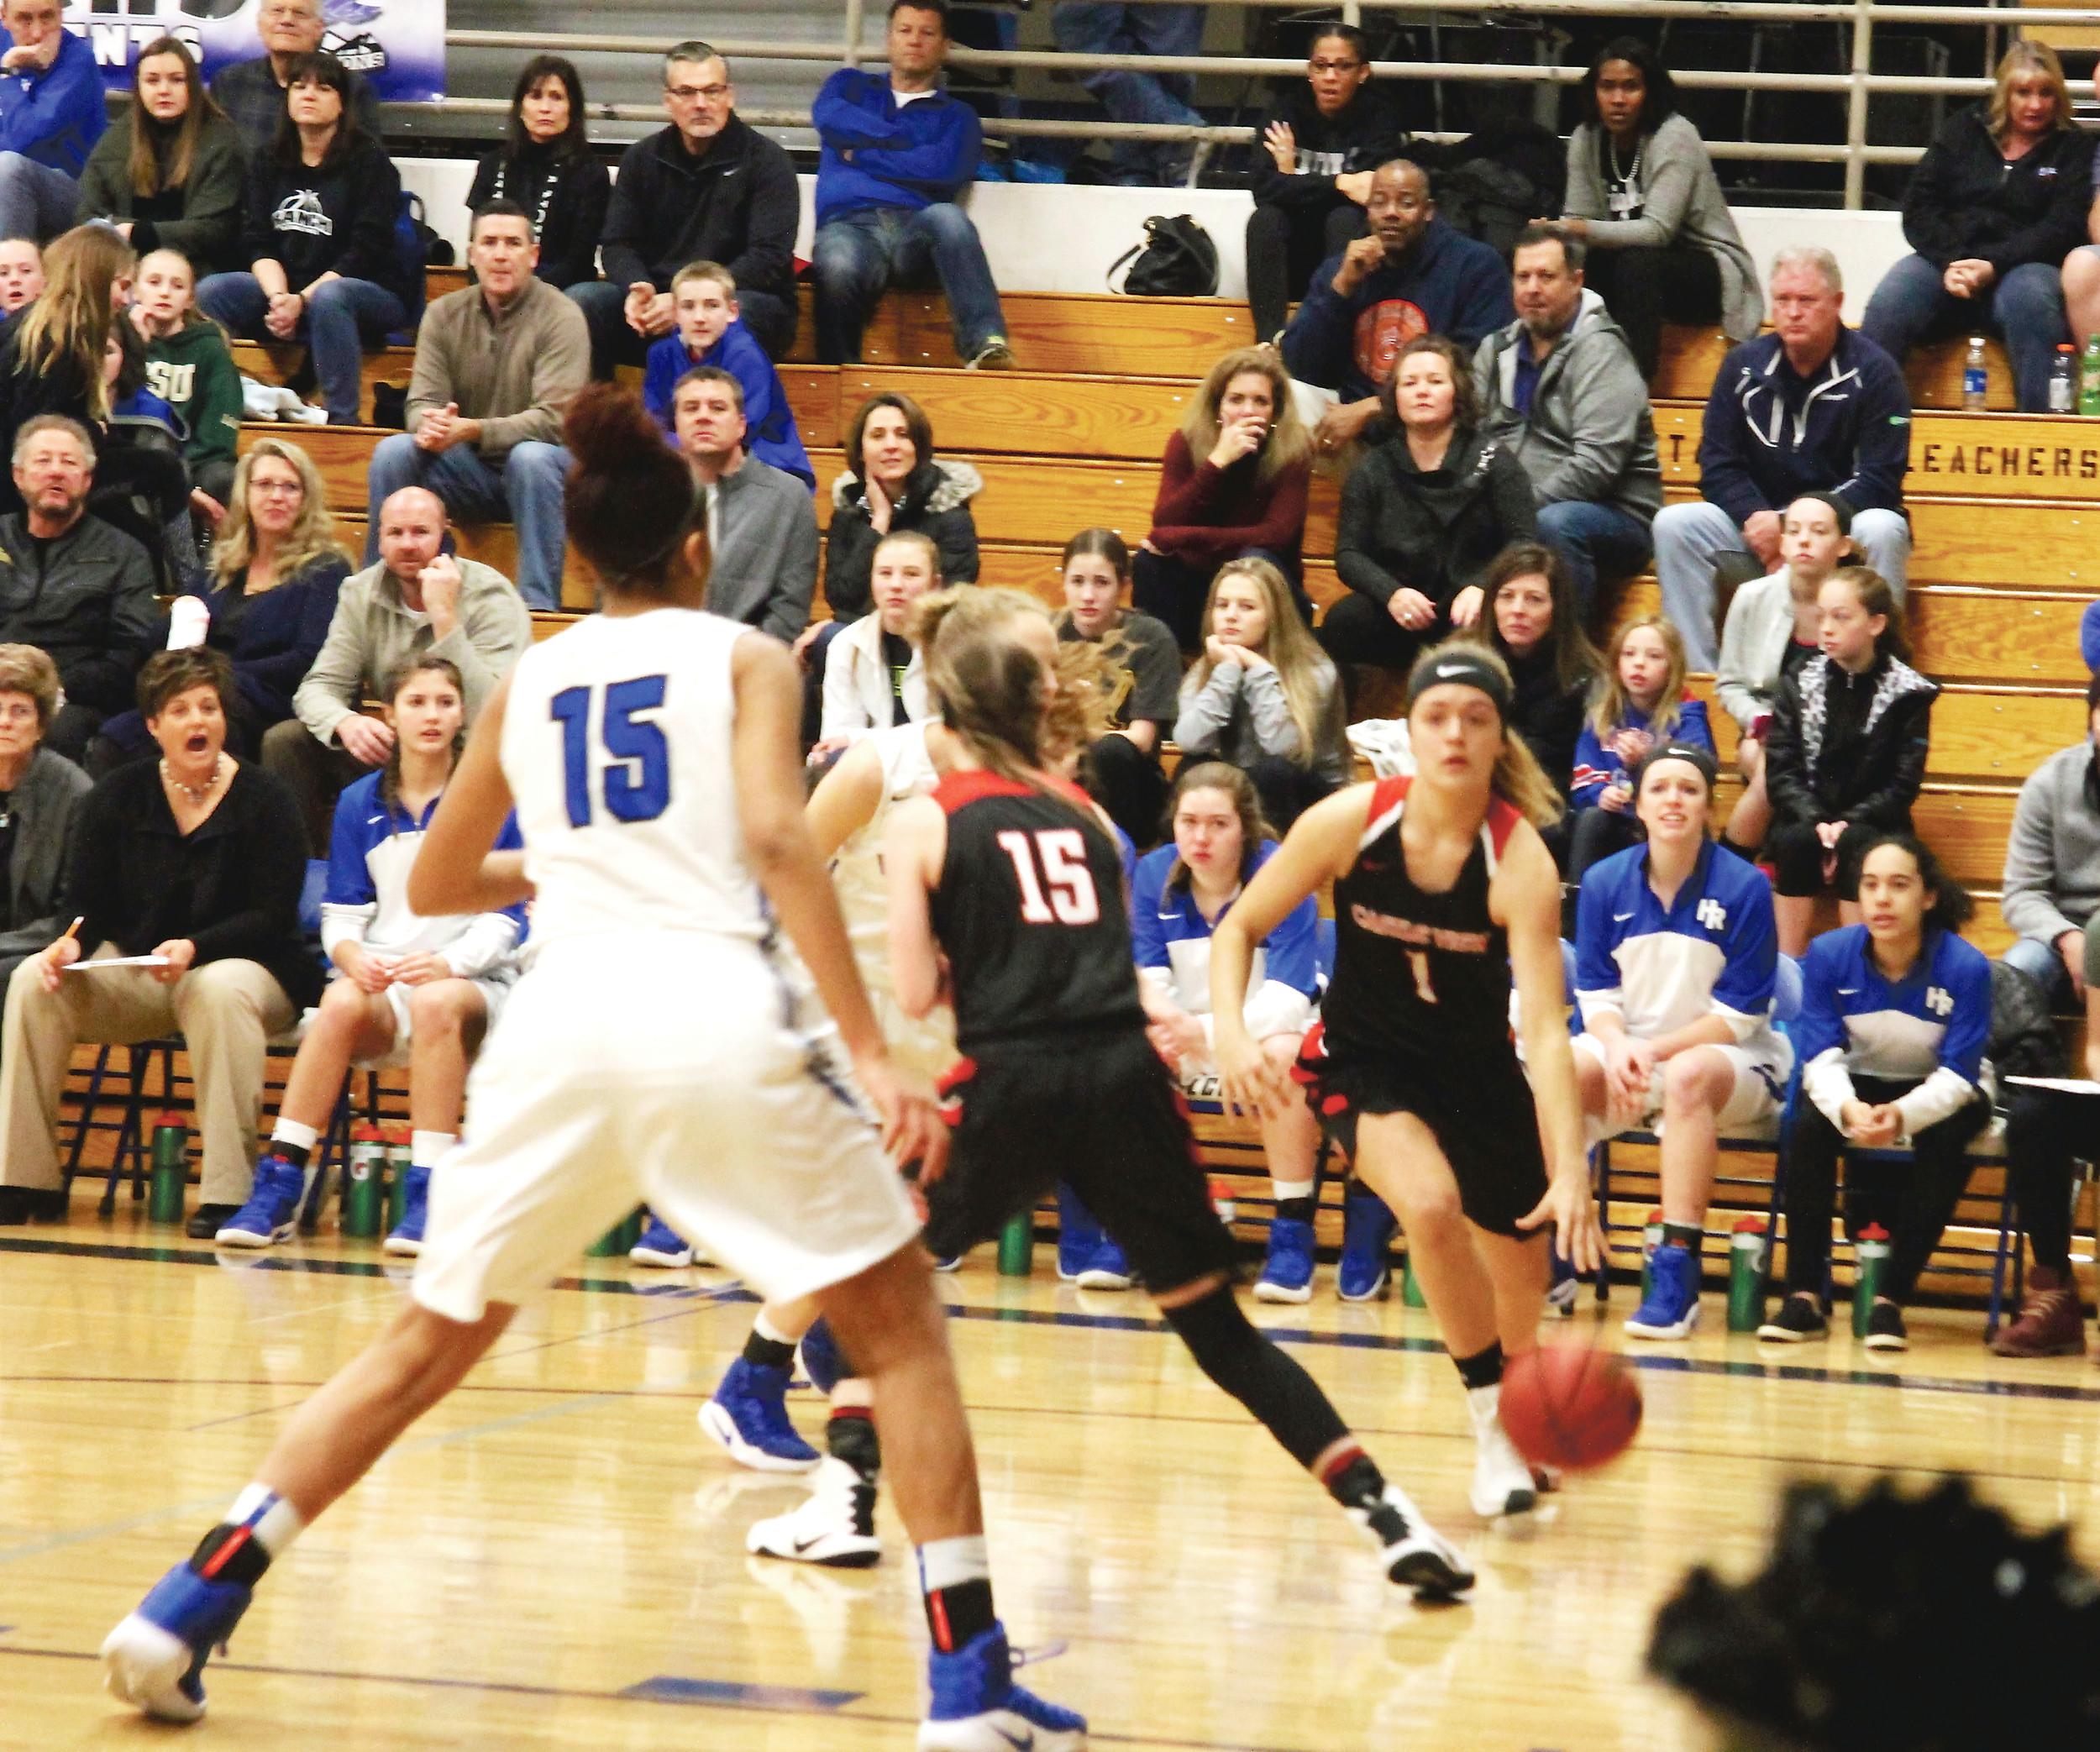 Highlands Ranch Youth Basketball: Sabercats Girls Coach Looks Back, Forward